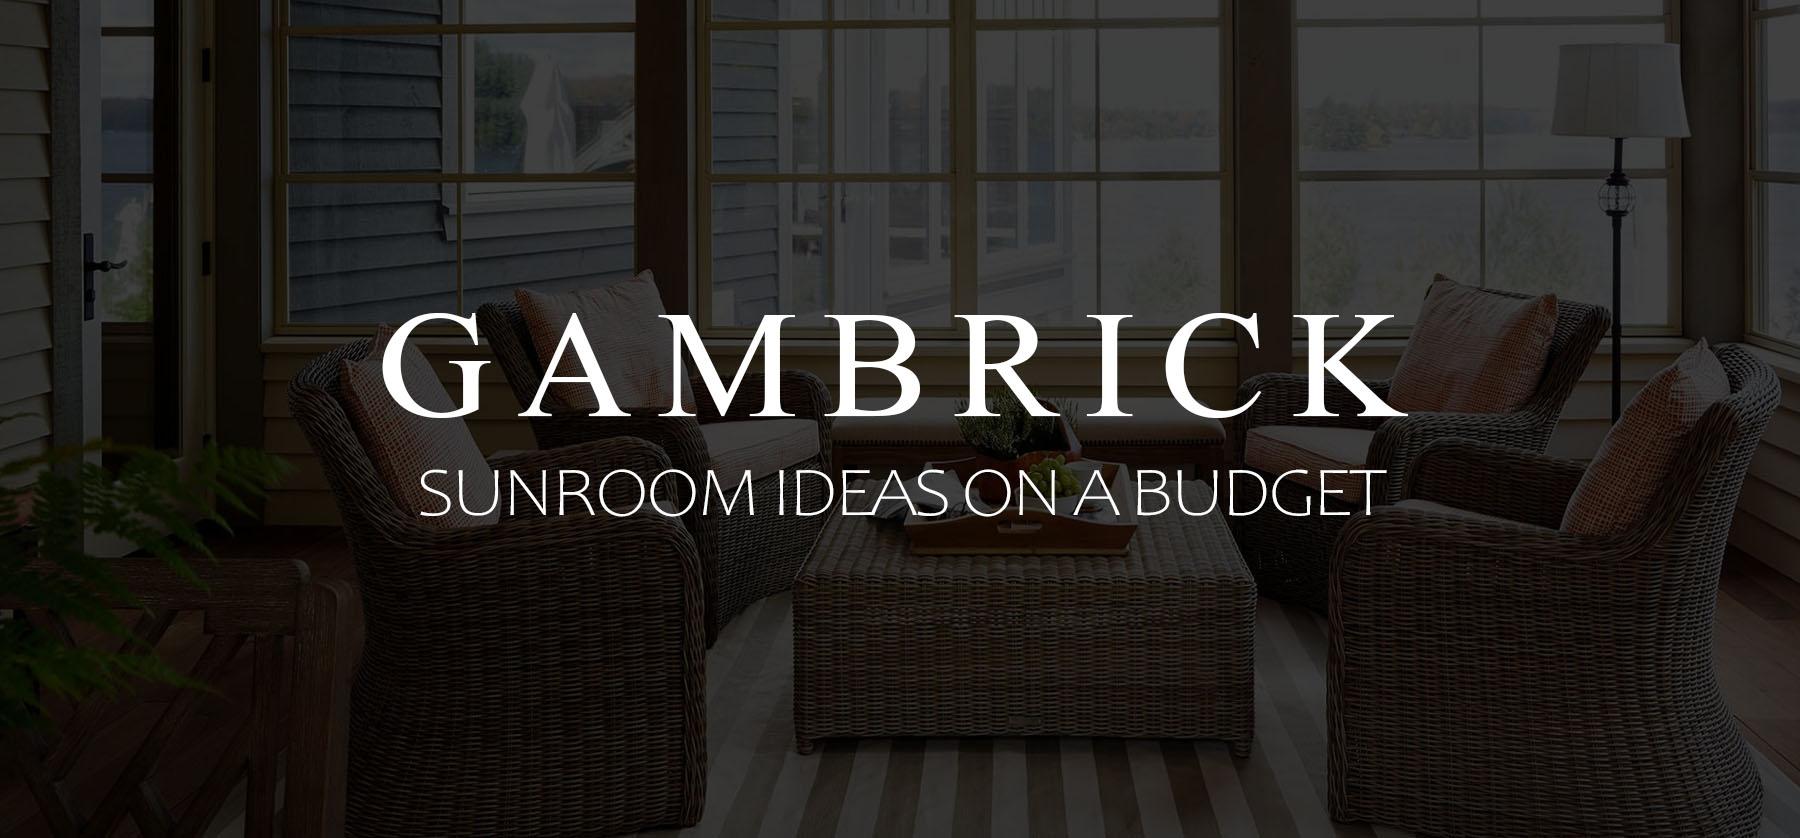 sunroom ideas on a budget budget